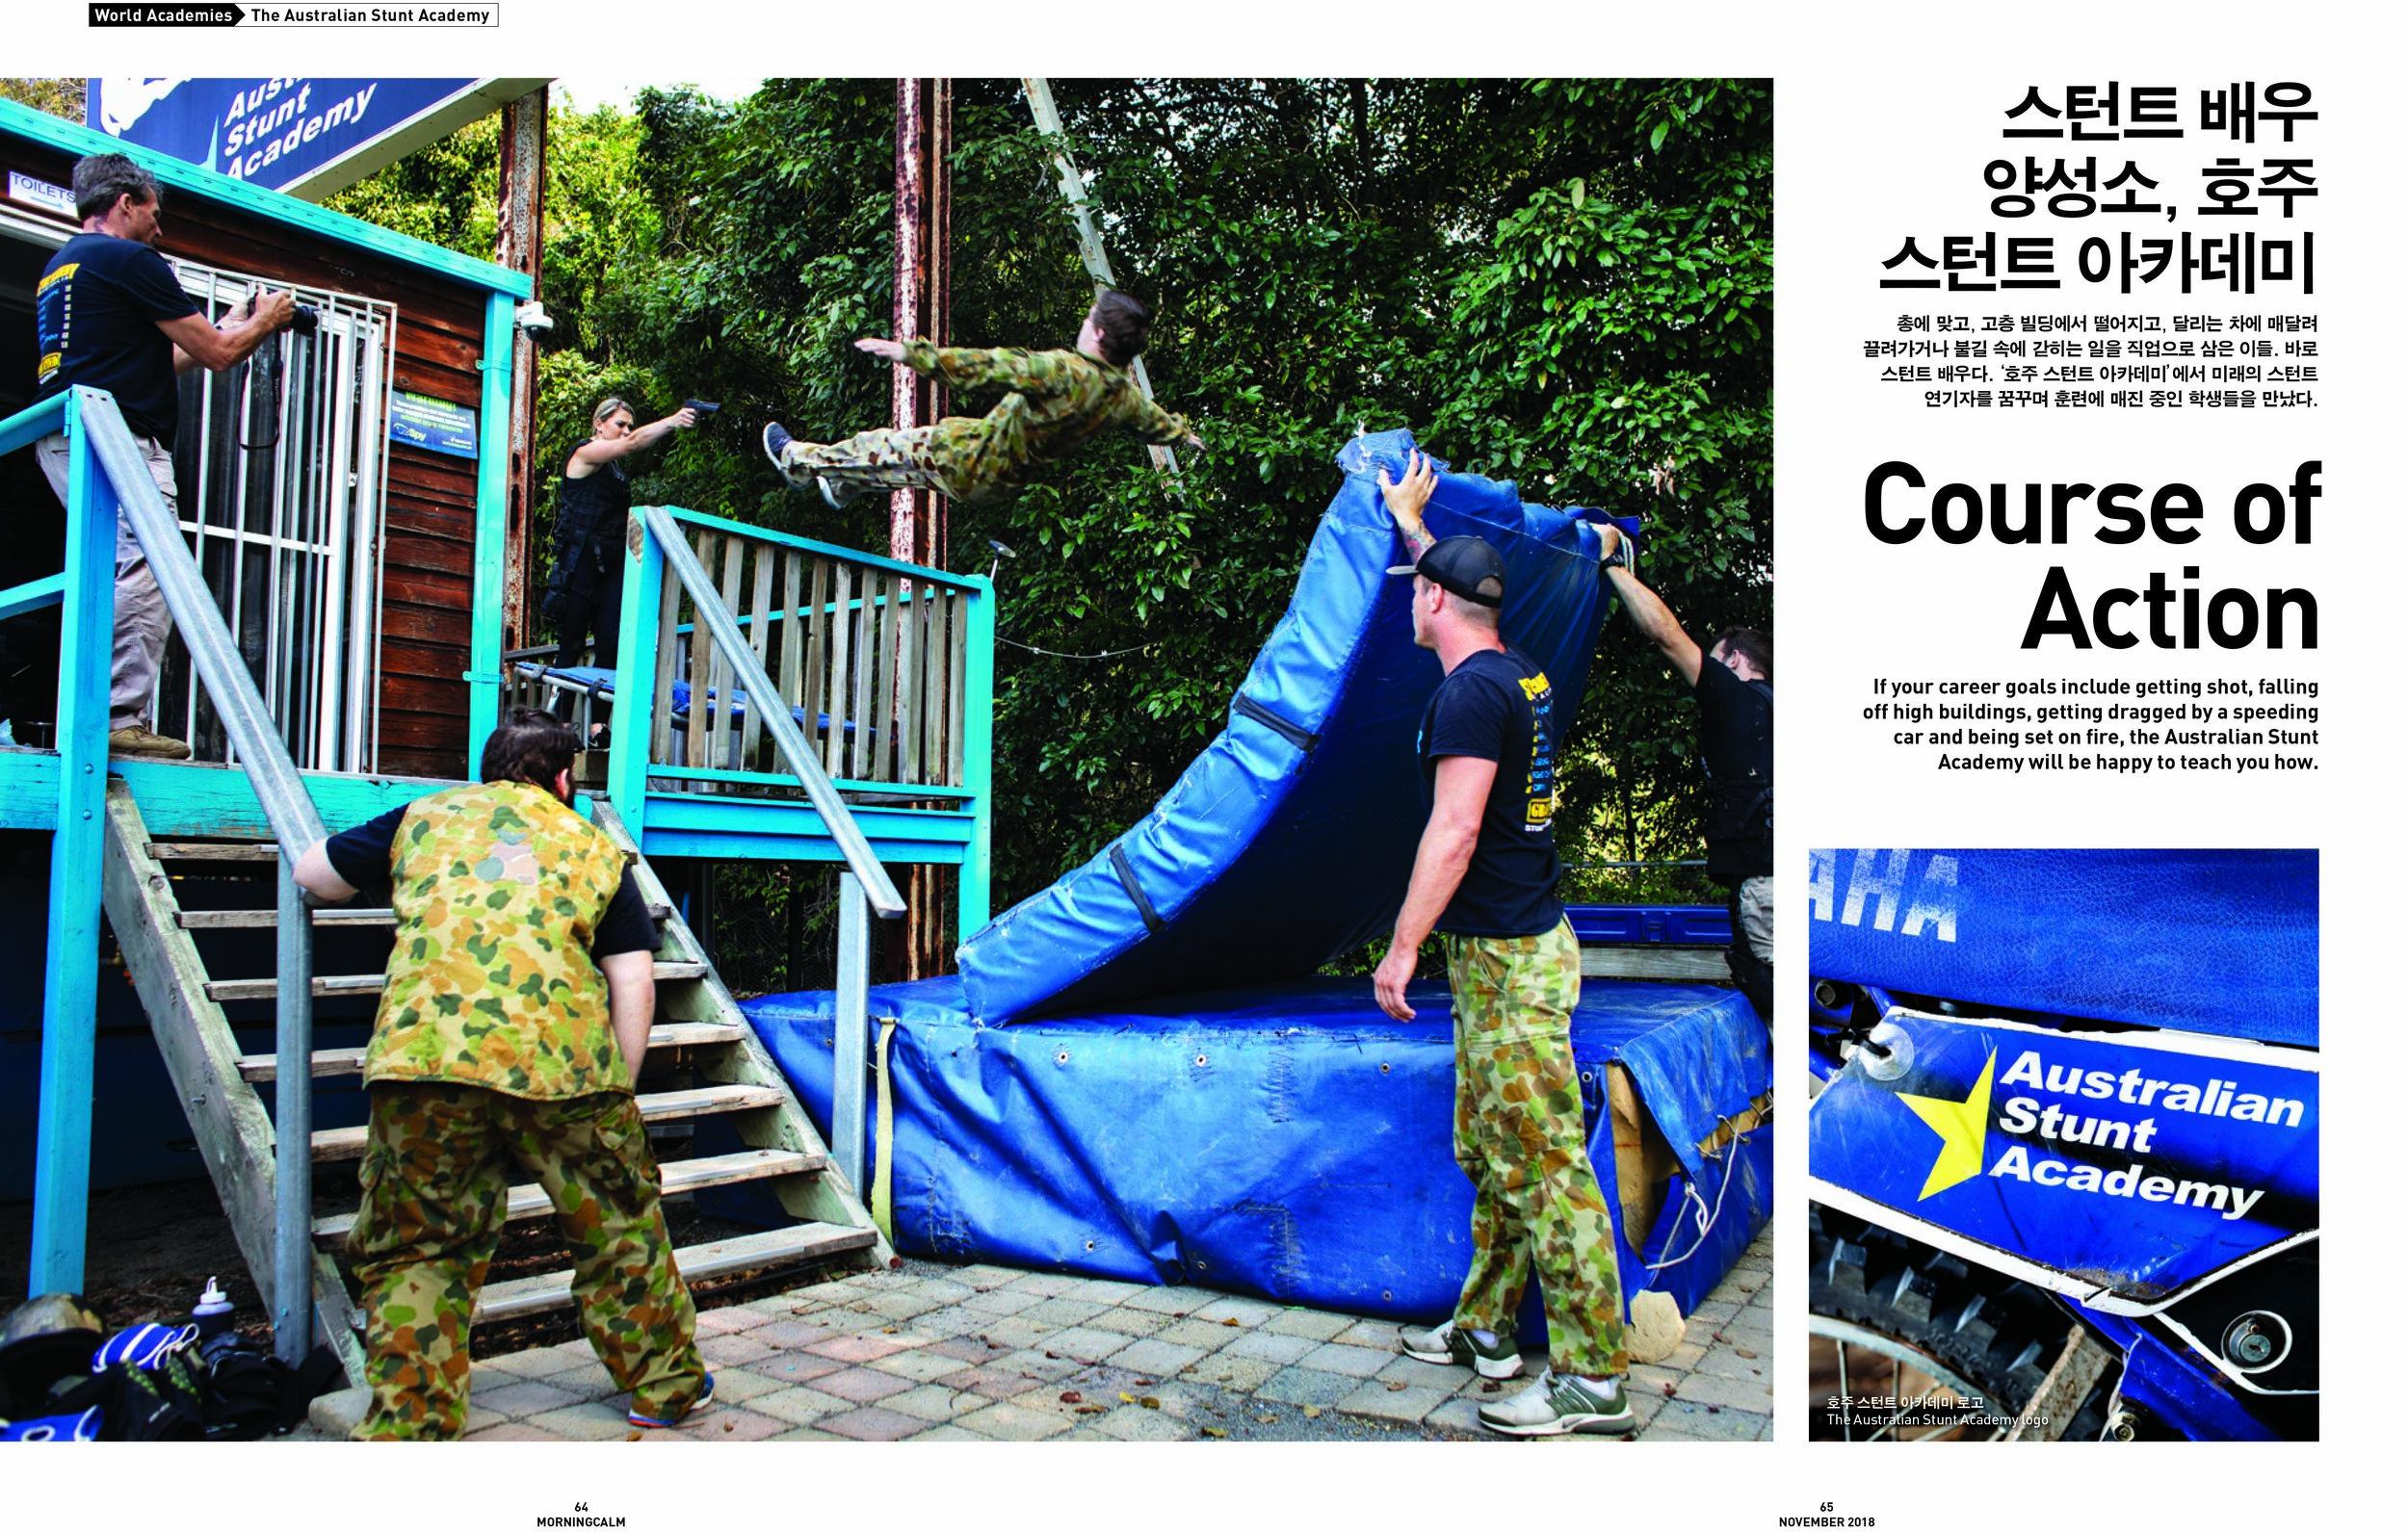 11 - World Academies - The Australian Stunt Academy-1.jpg